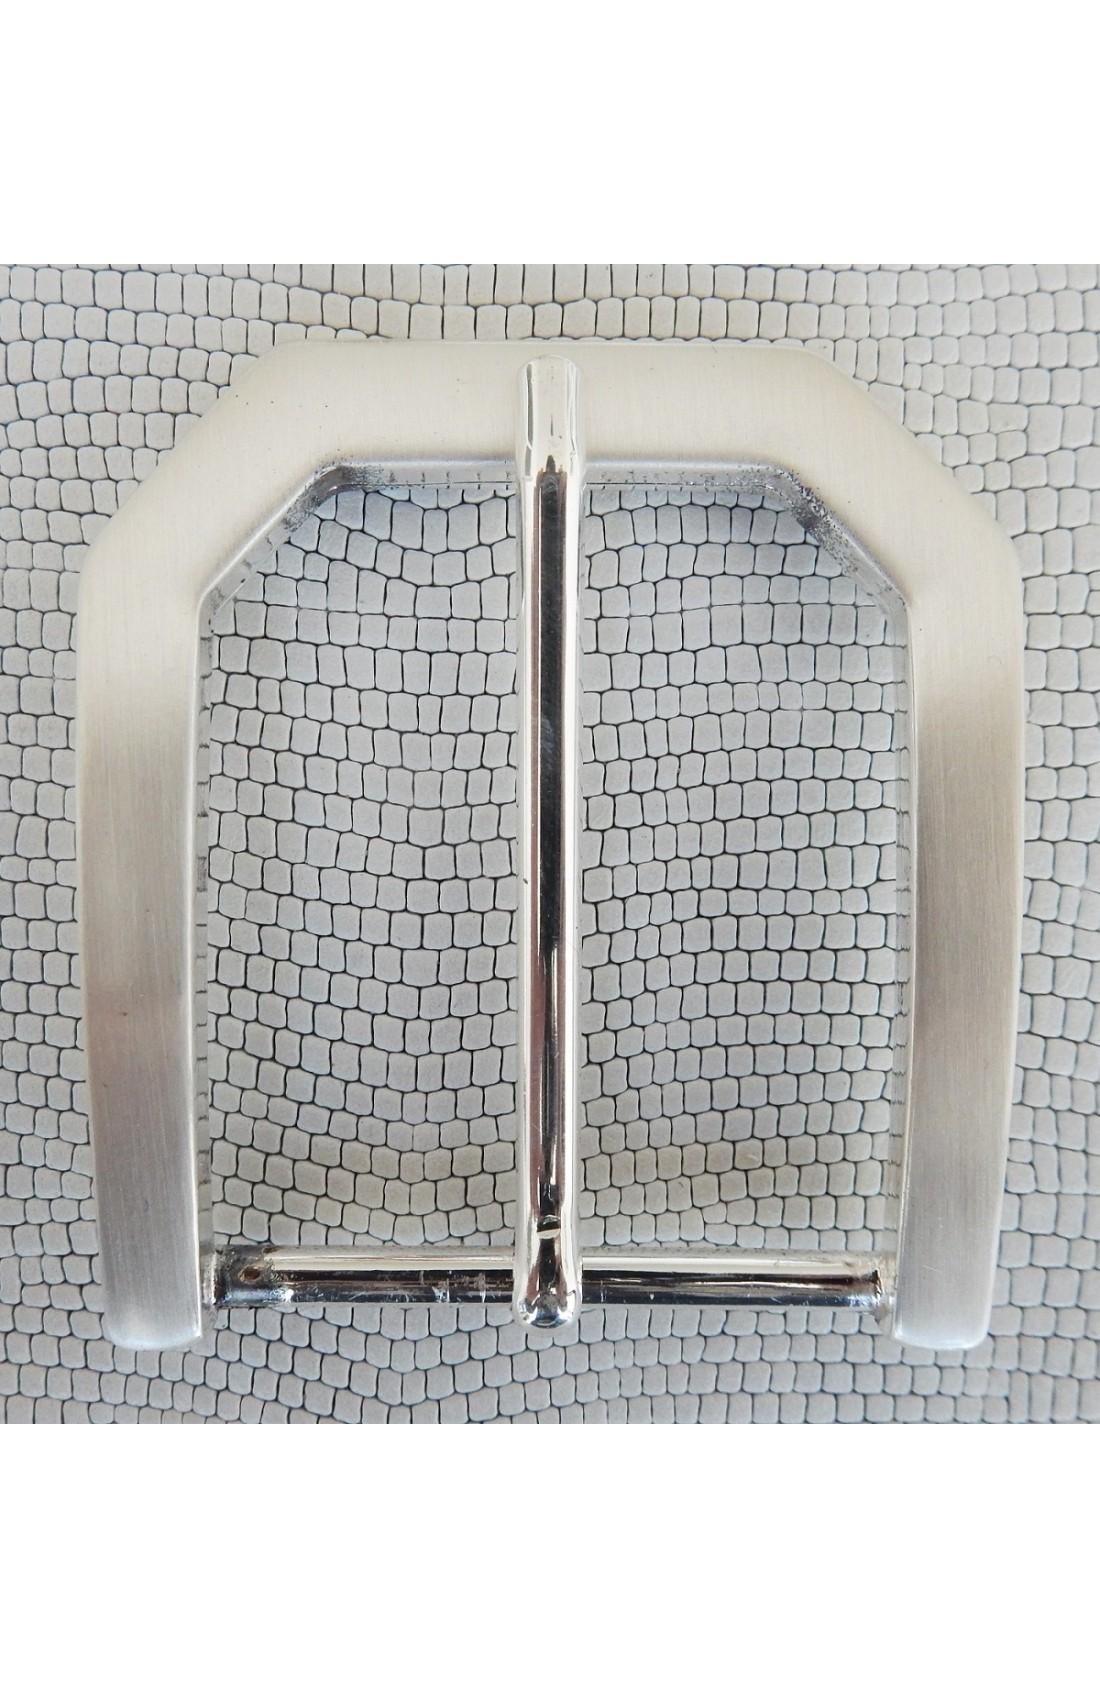 Fibbia Standard Z 48 mm.40 argento satinato (1)